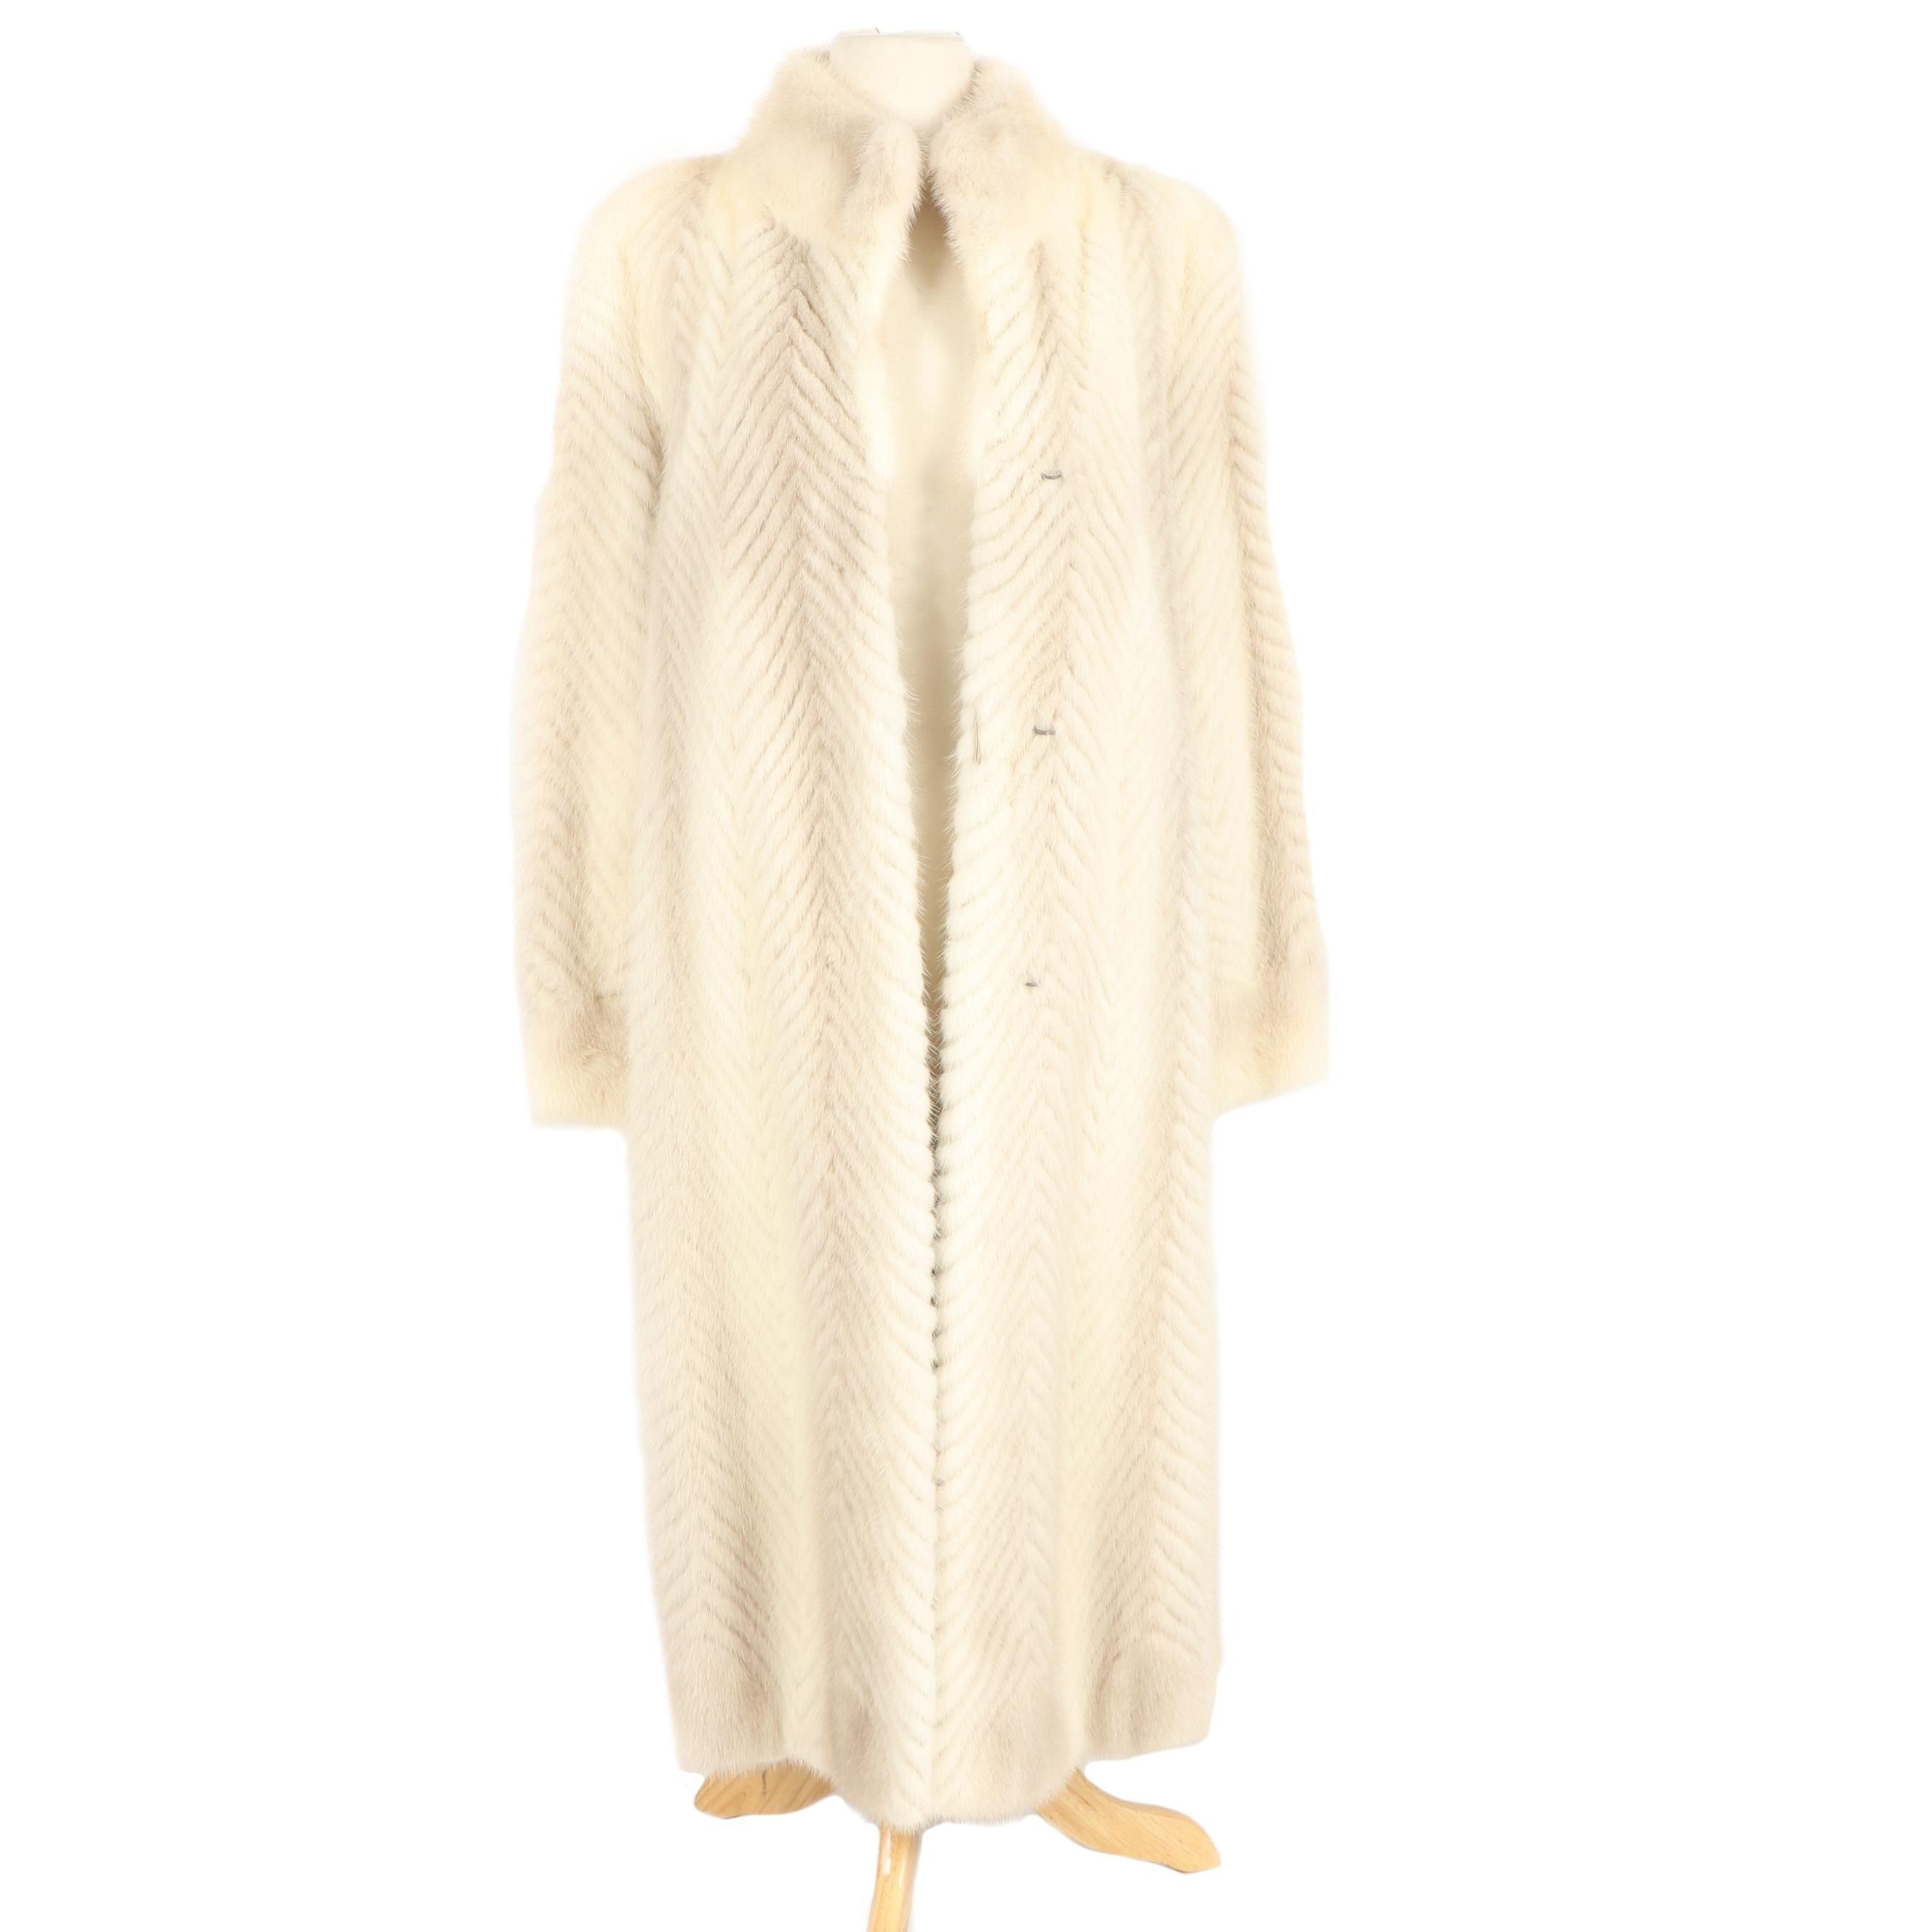 Vintage Amoress Furmakers Chevron Saga Tourmaline Mink Fur Coat